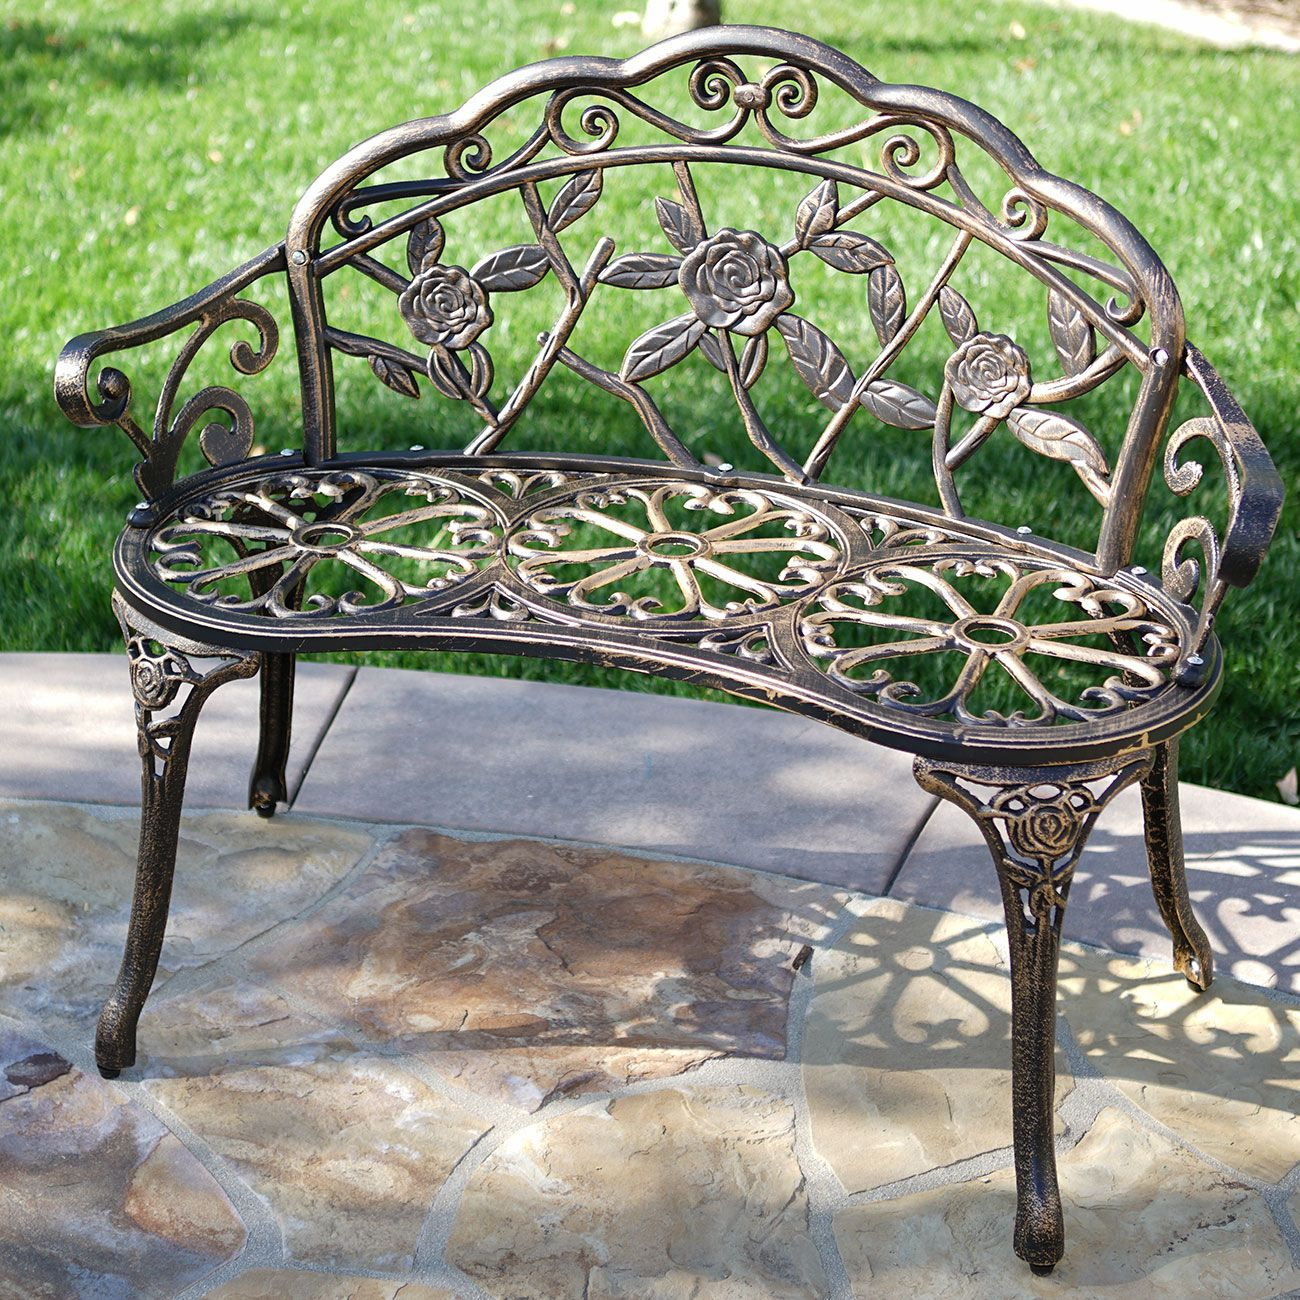 41 Top Collection Aluminum Garden Bench In 2020 Outdoor Garden Bench Metal Garden Benches Outdoor Bench